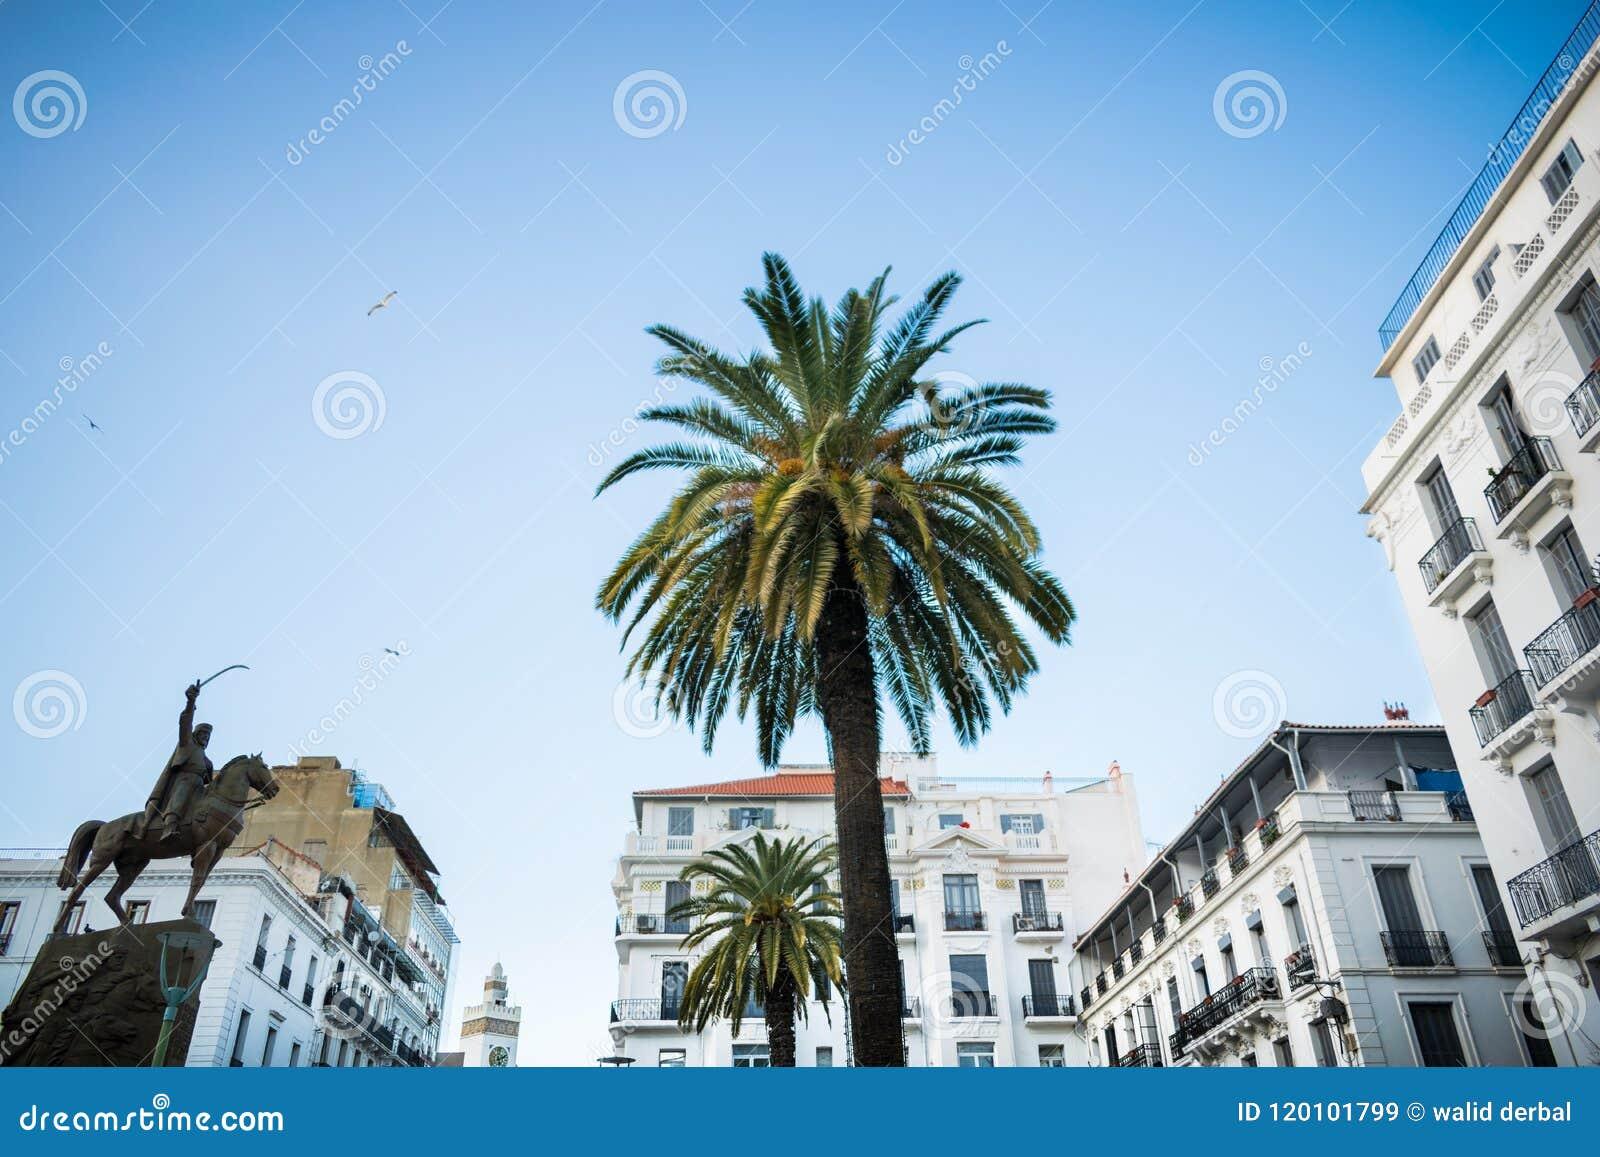 Palm tree in algiers city